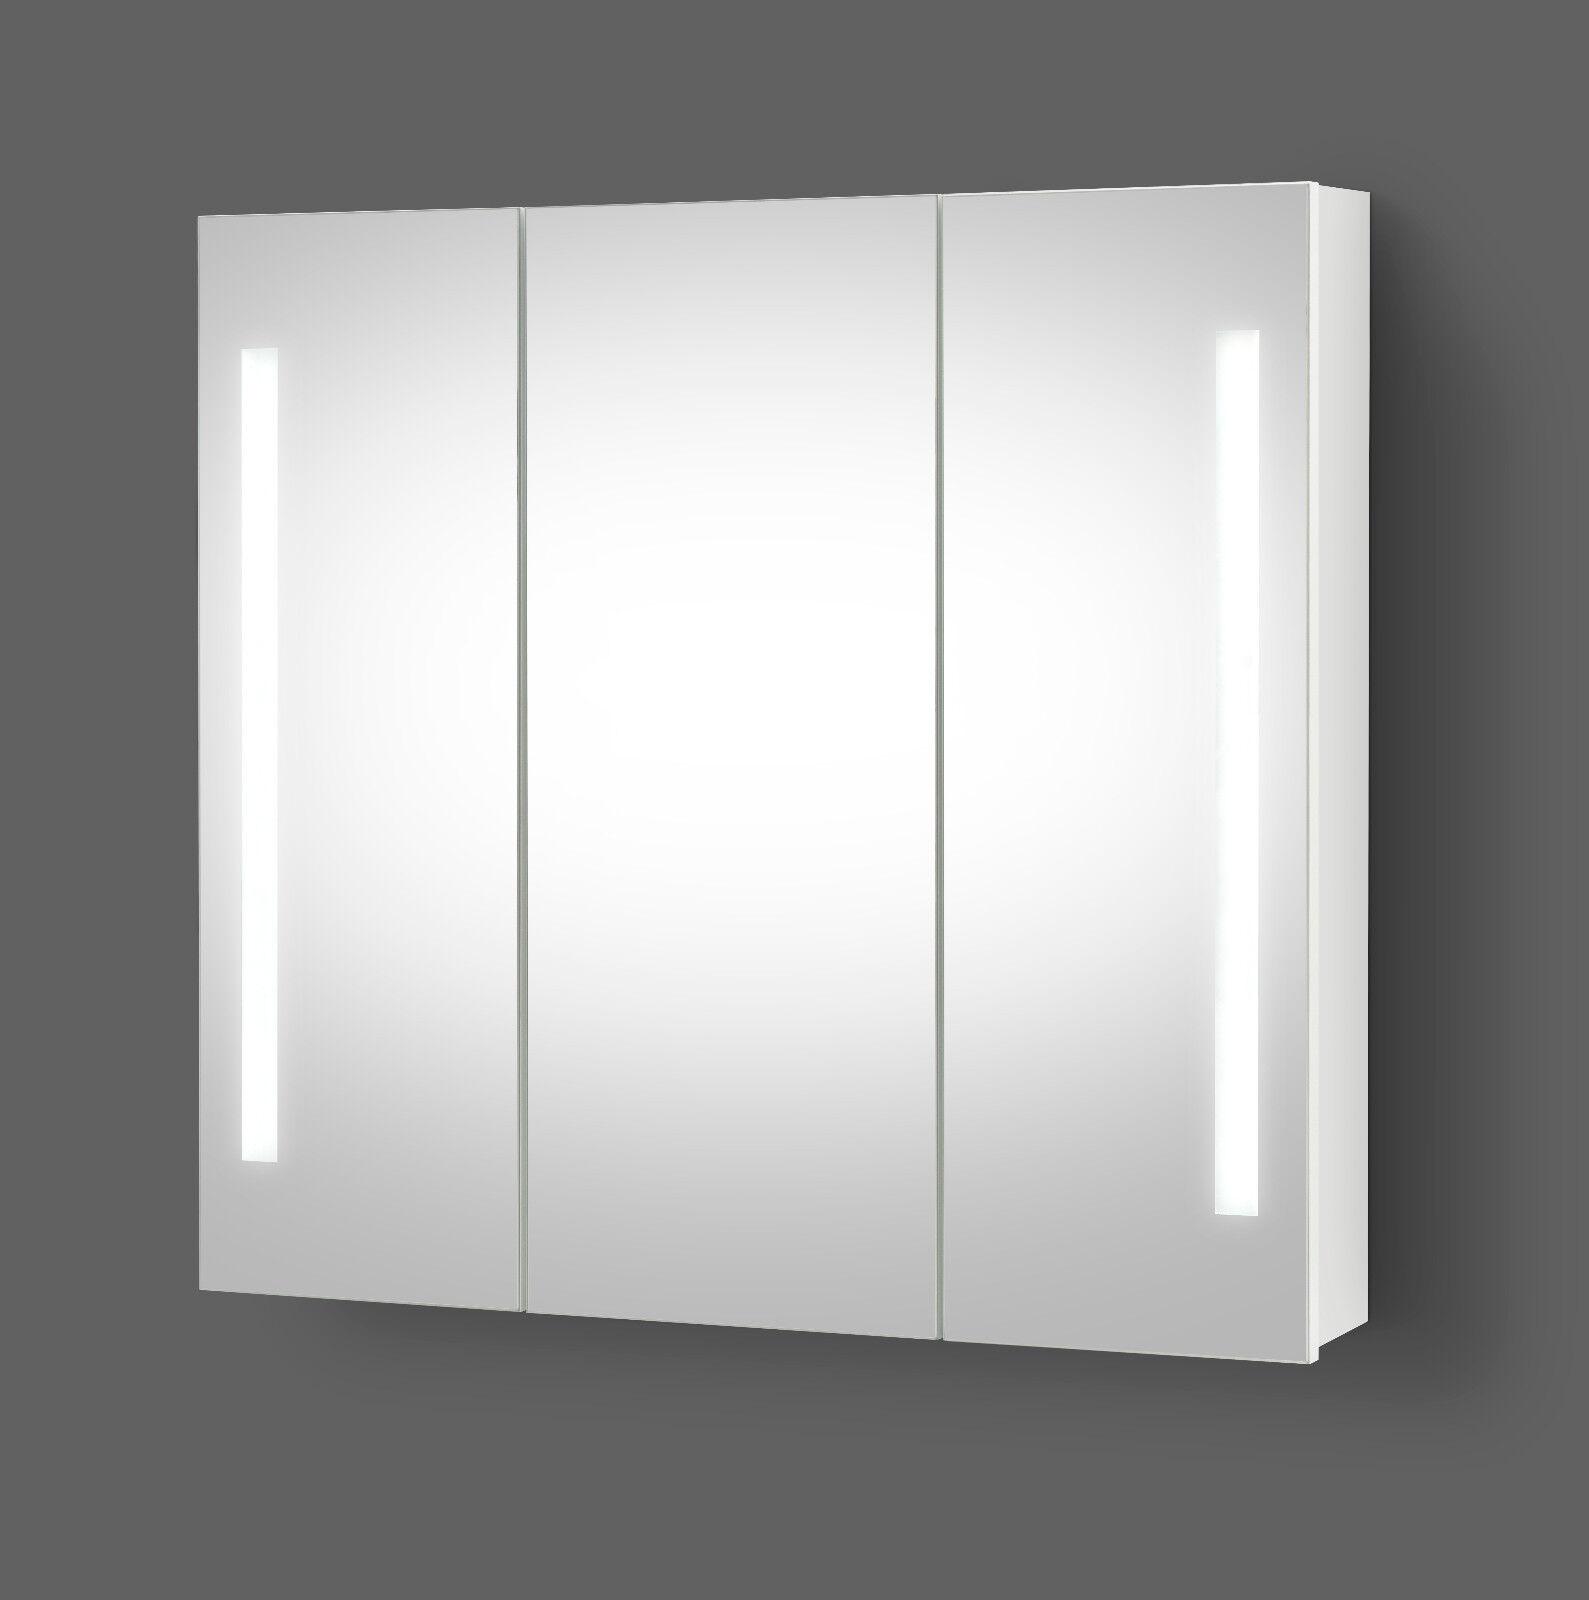 LED Spiegelschrank Bad Bad Bad Spiegelschrank Spiegelschrank mit LED ...